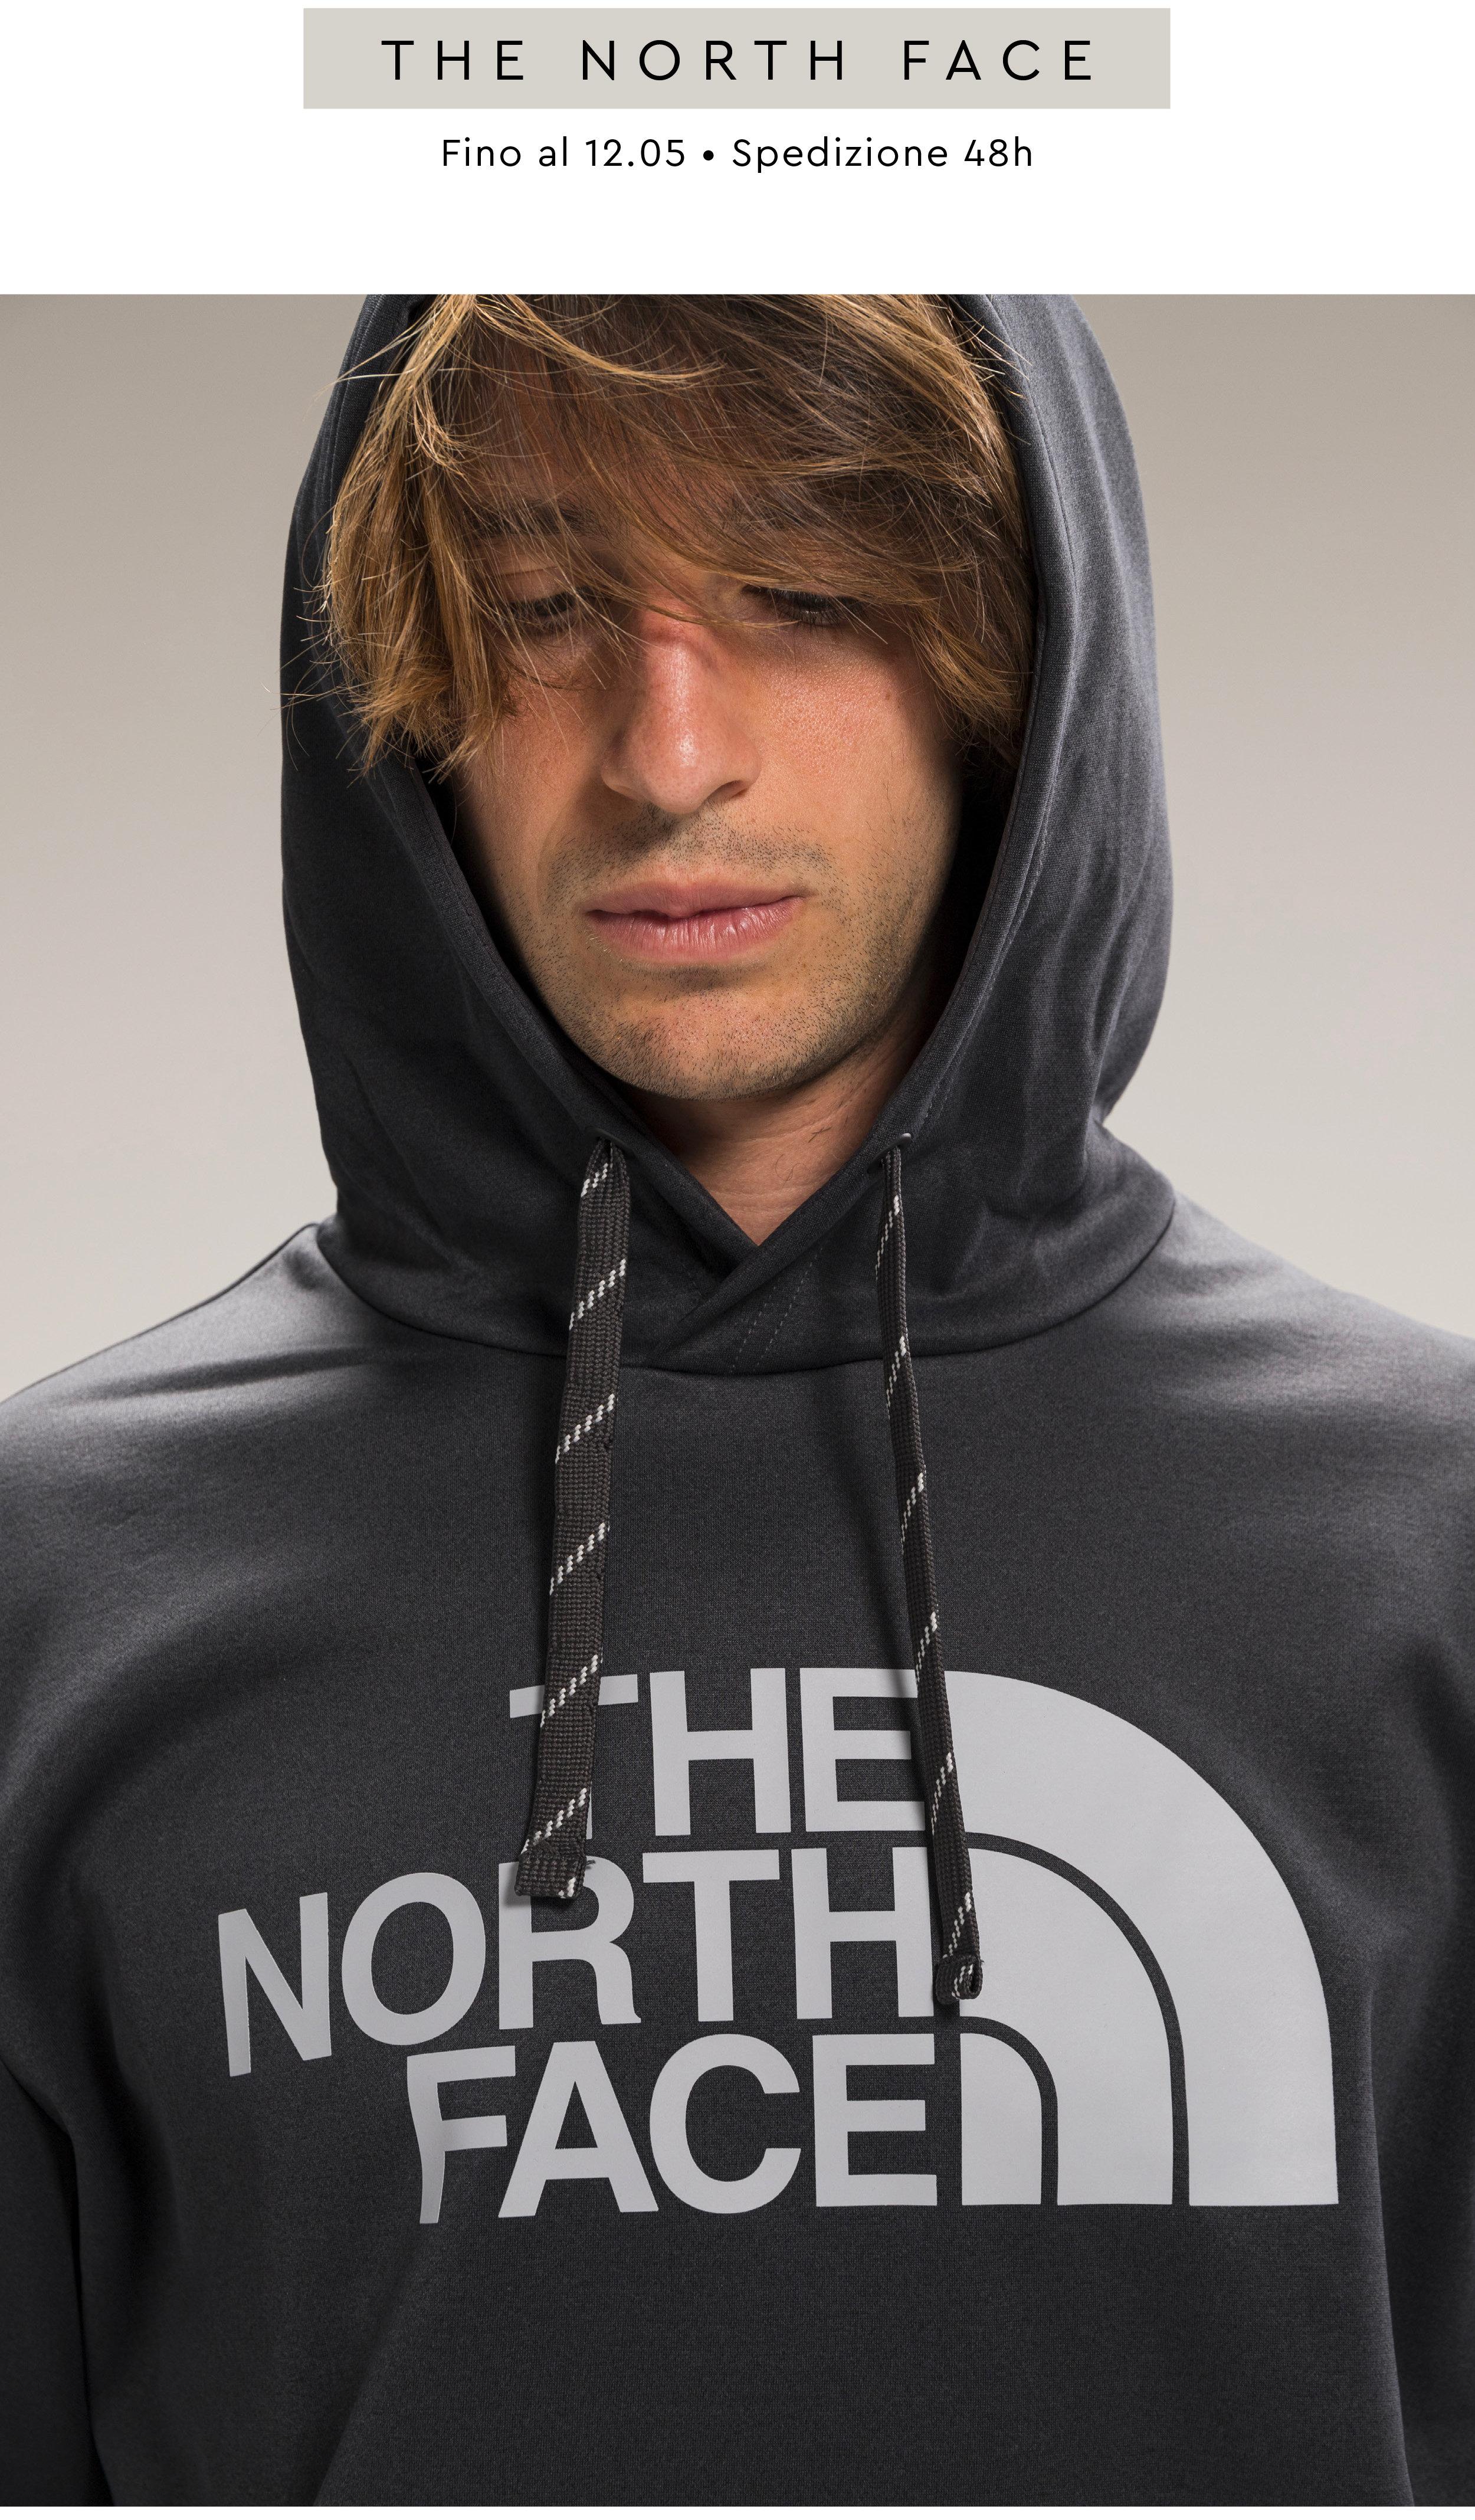 The North Face capi tecnici contemporanei performanti.